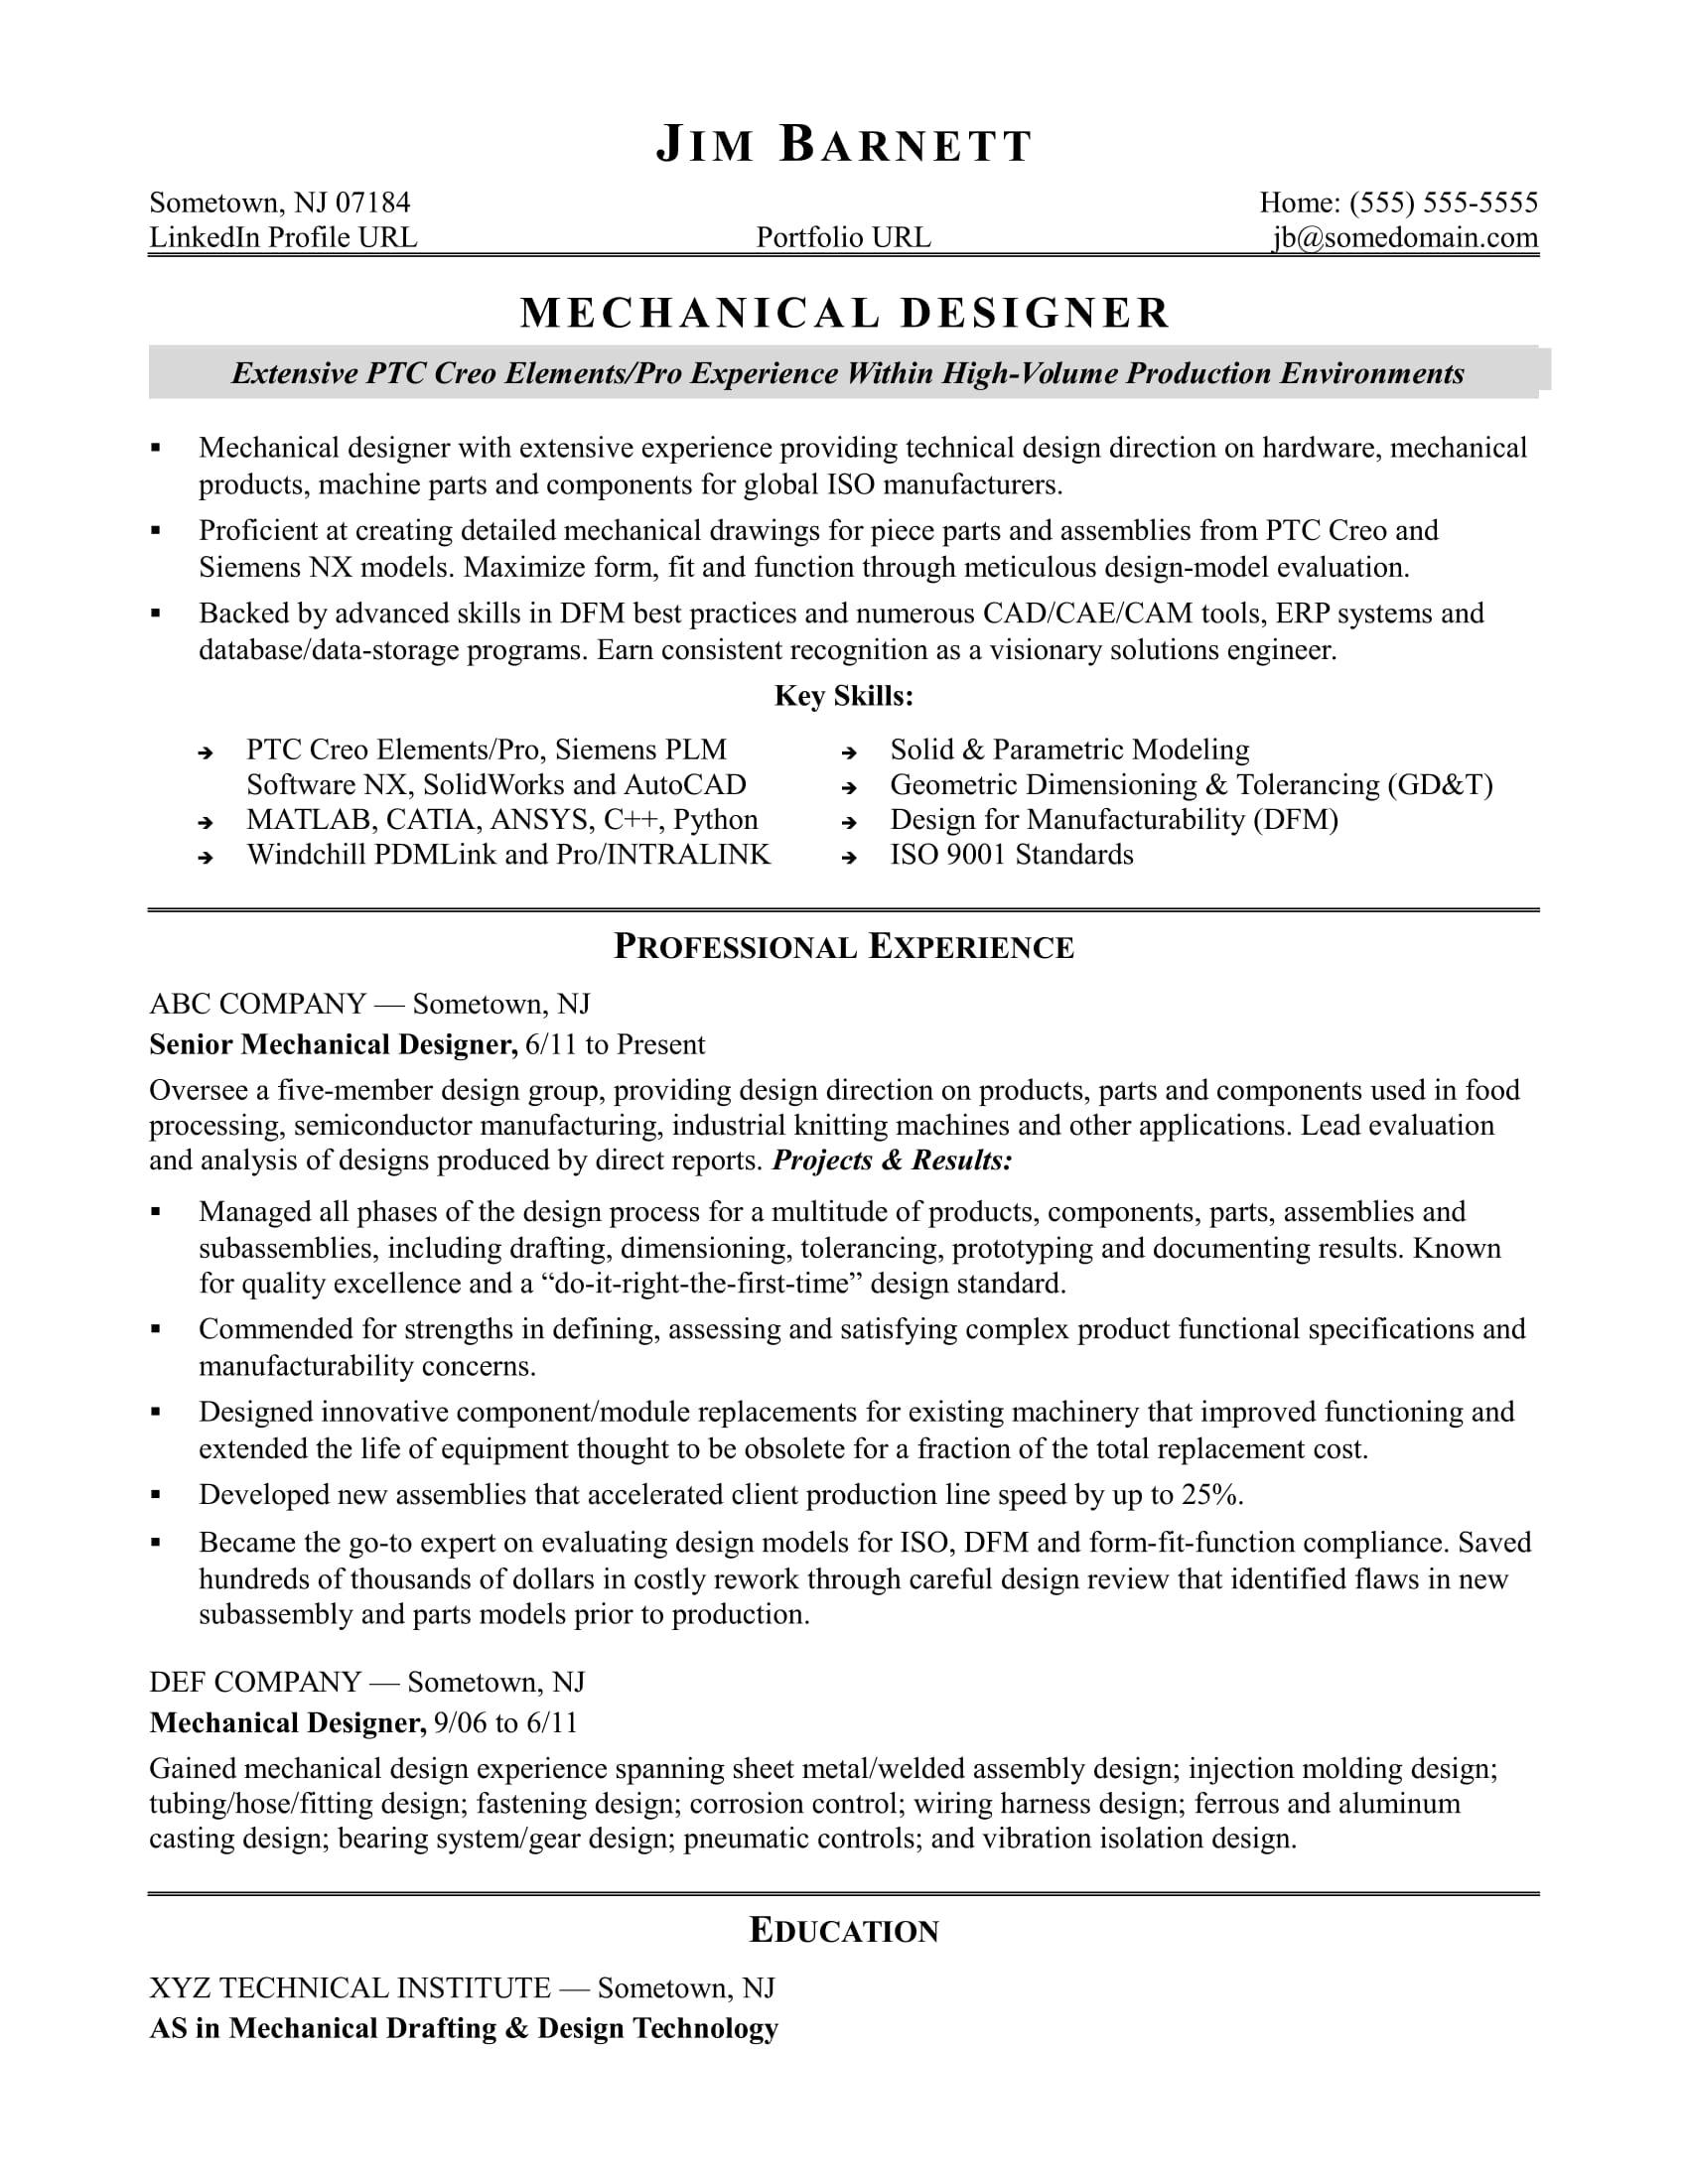 Cover Letter Design Engineer Mechanical] mechanical design ...